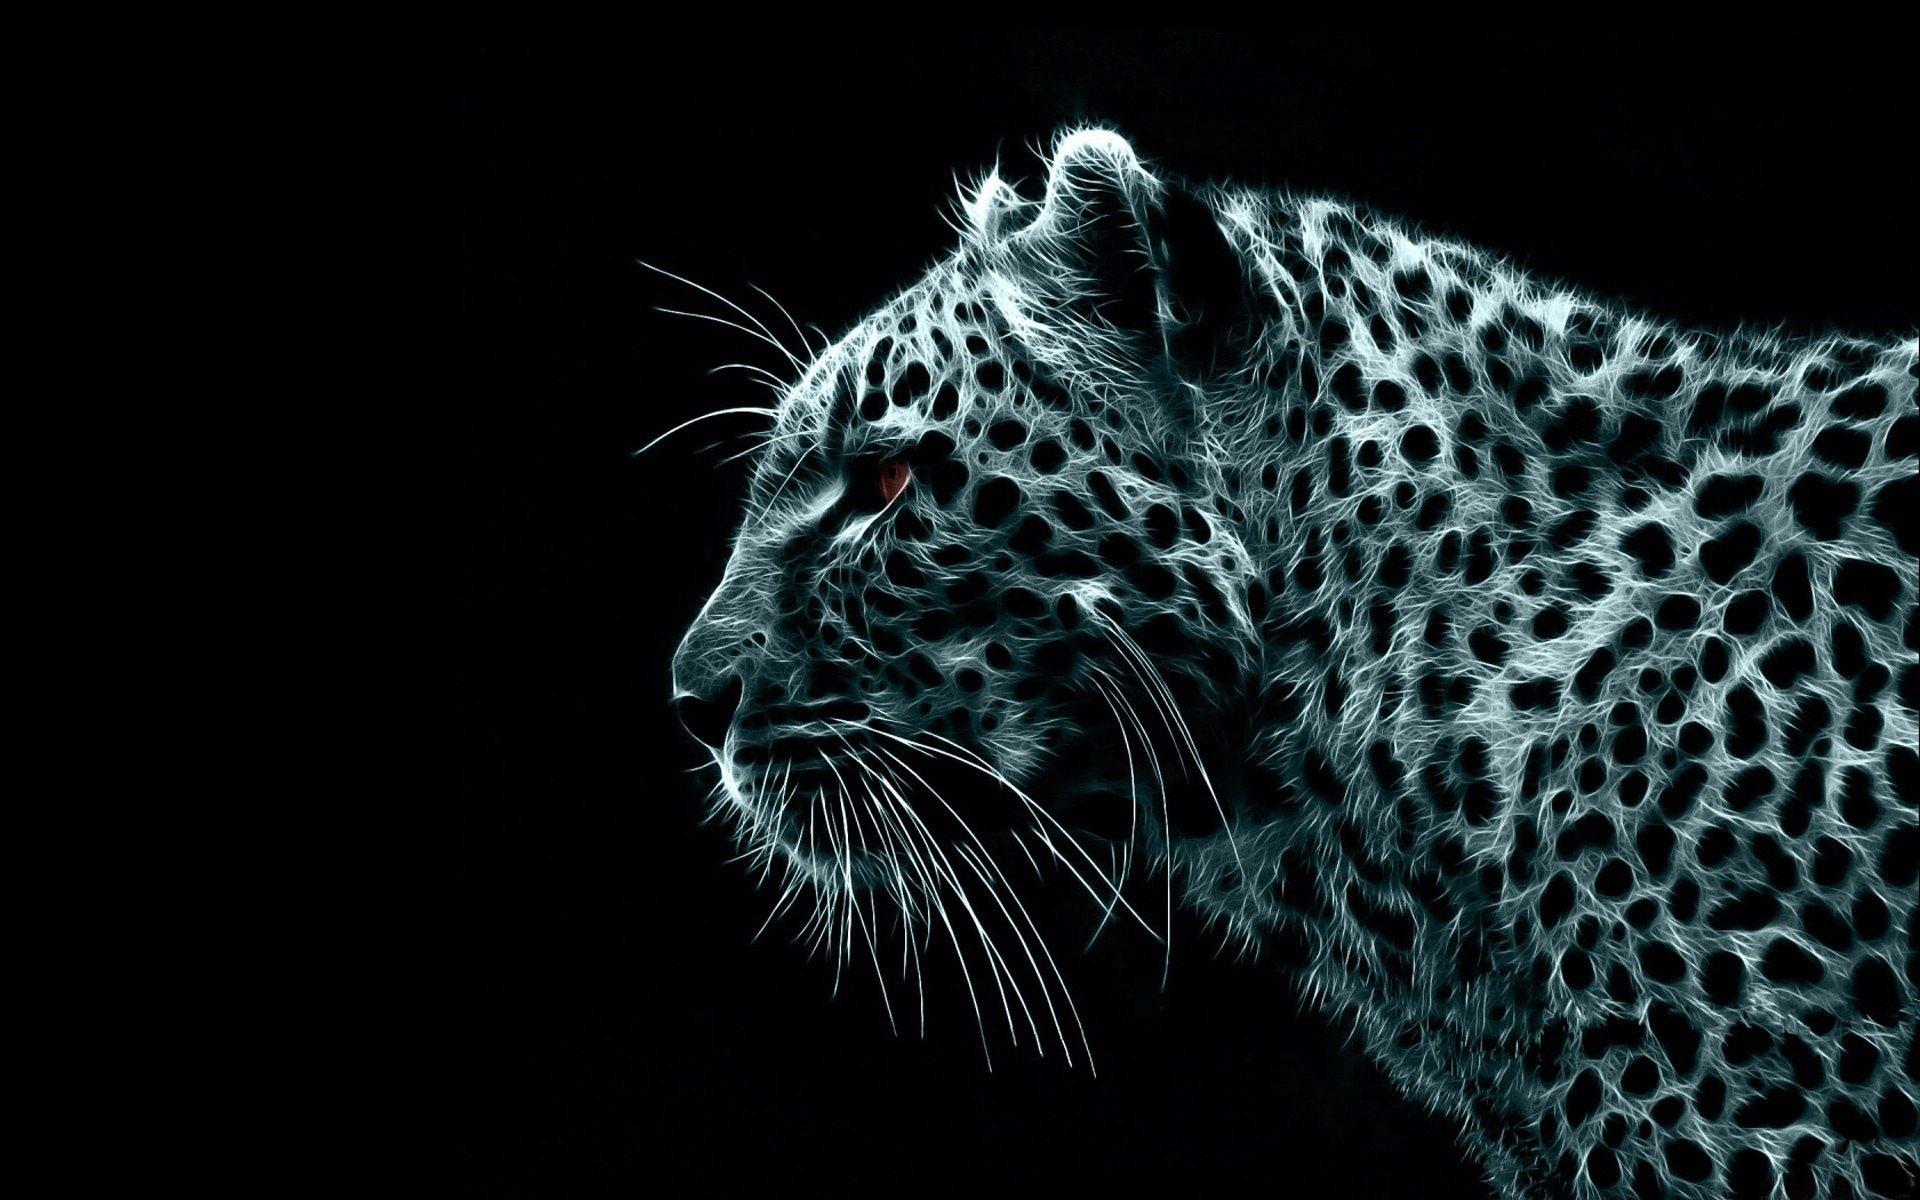 Amazing Wallpaper Mac Snow Leopard - 371bef81cf50ced7401246b69fda1321  Gallery_28180.jpg